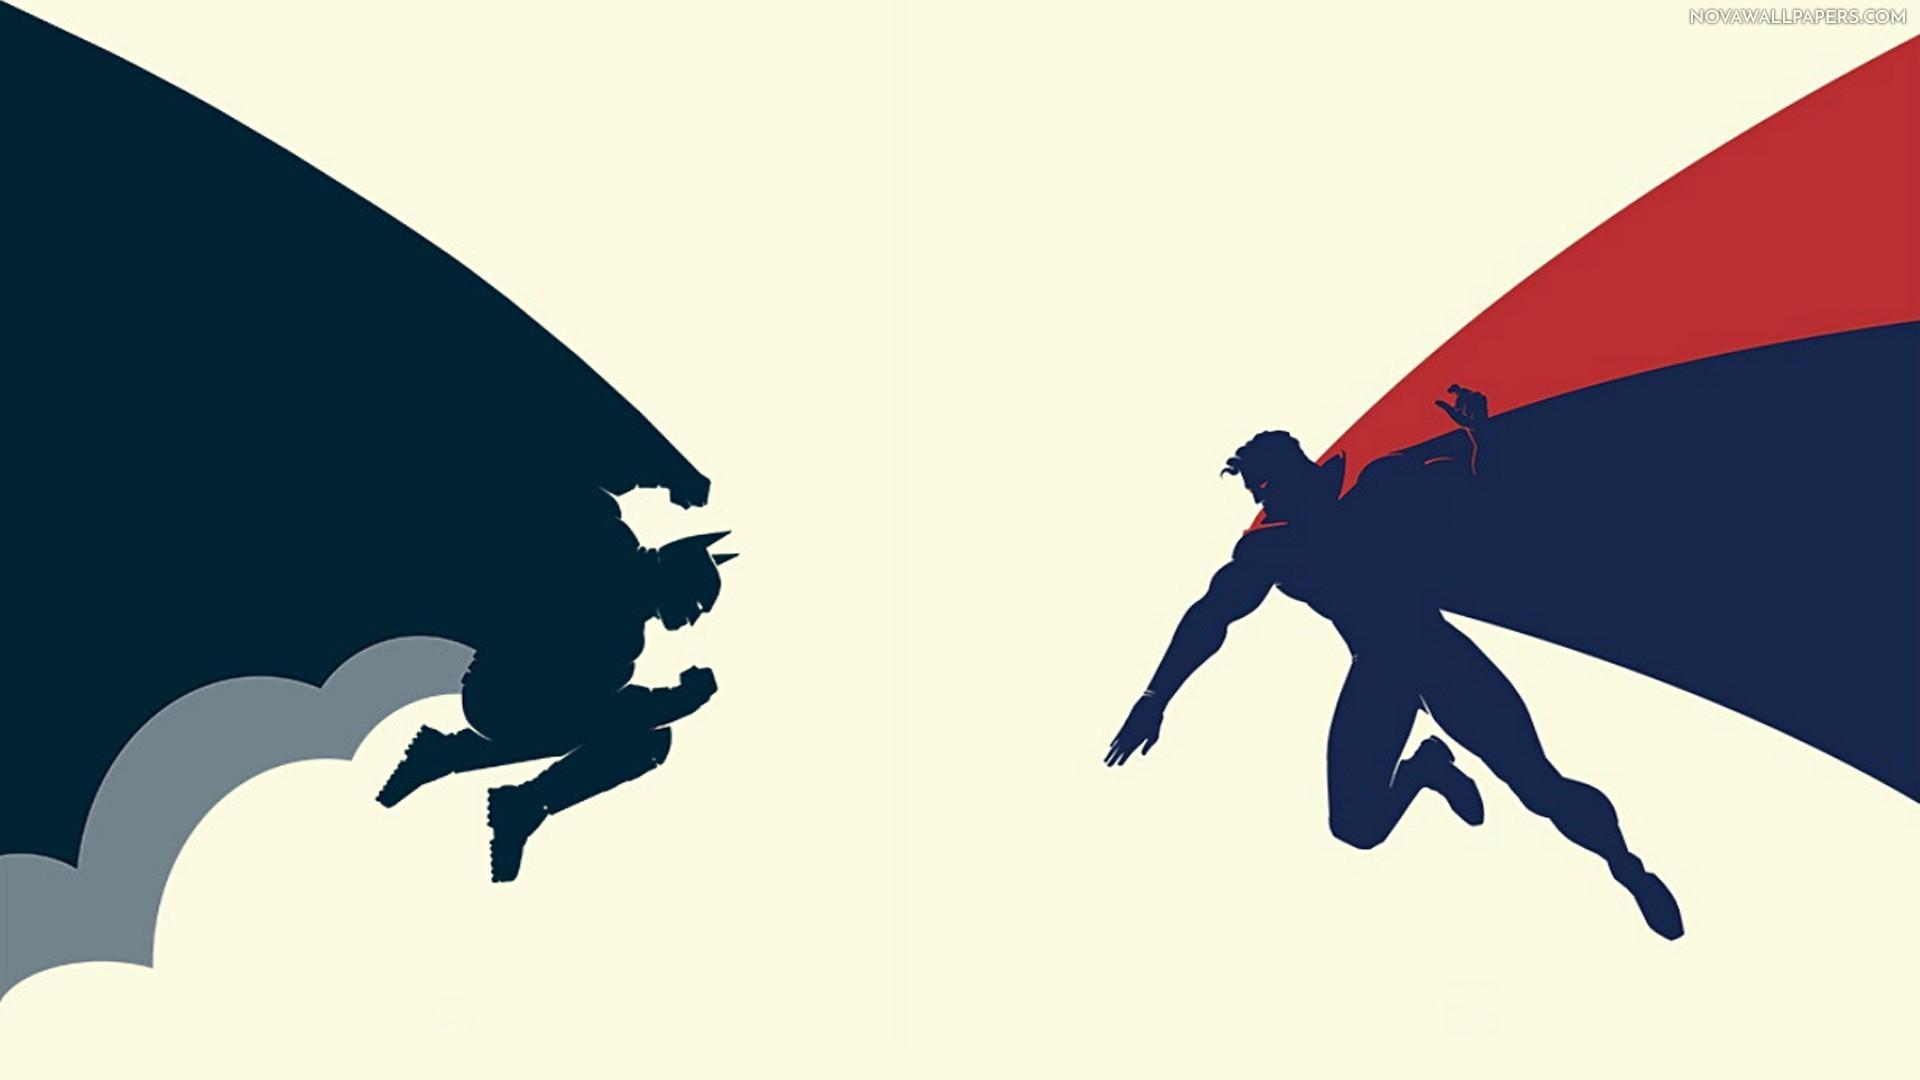 NoVa Batman vs Superman Batman Vs Superman Dawn Of Justice Minimalist 1920x1080